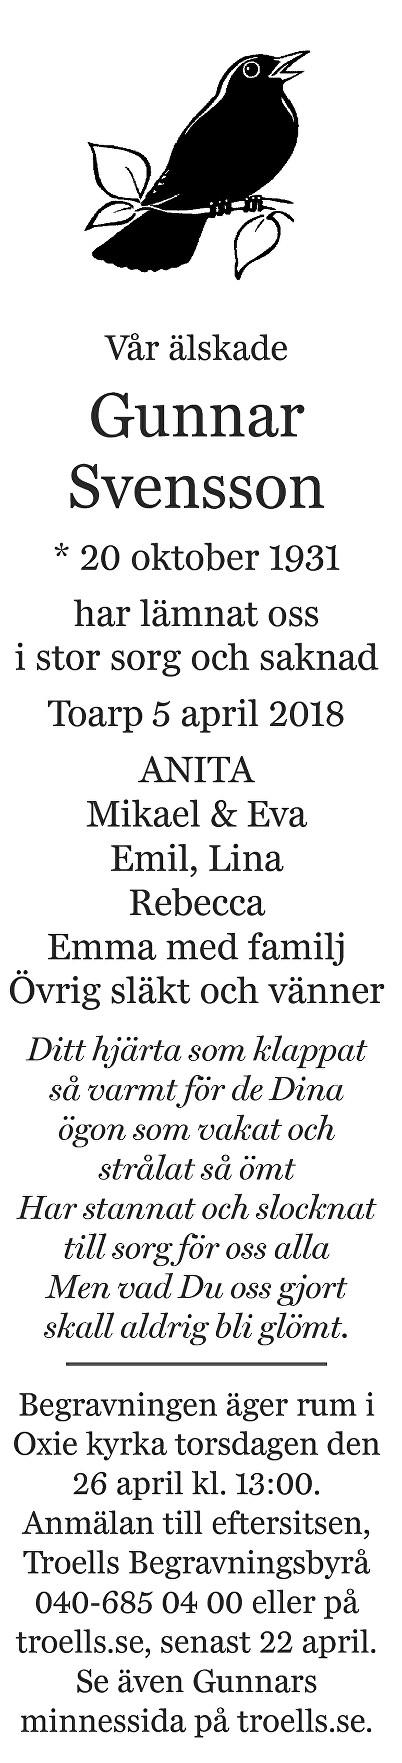 Gunnar Svensson Death notice